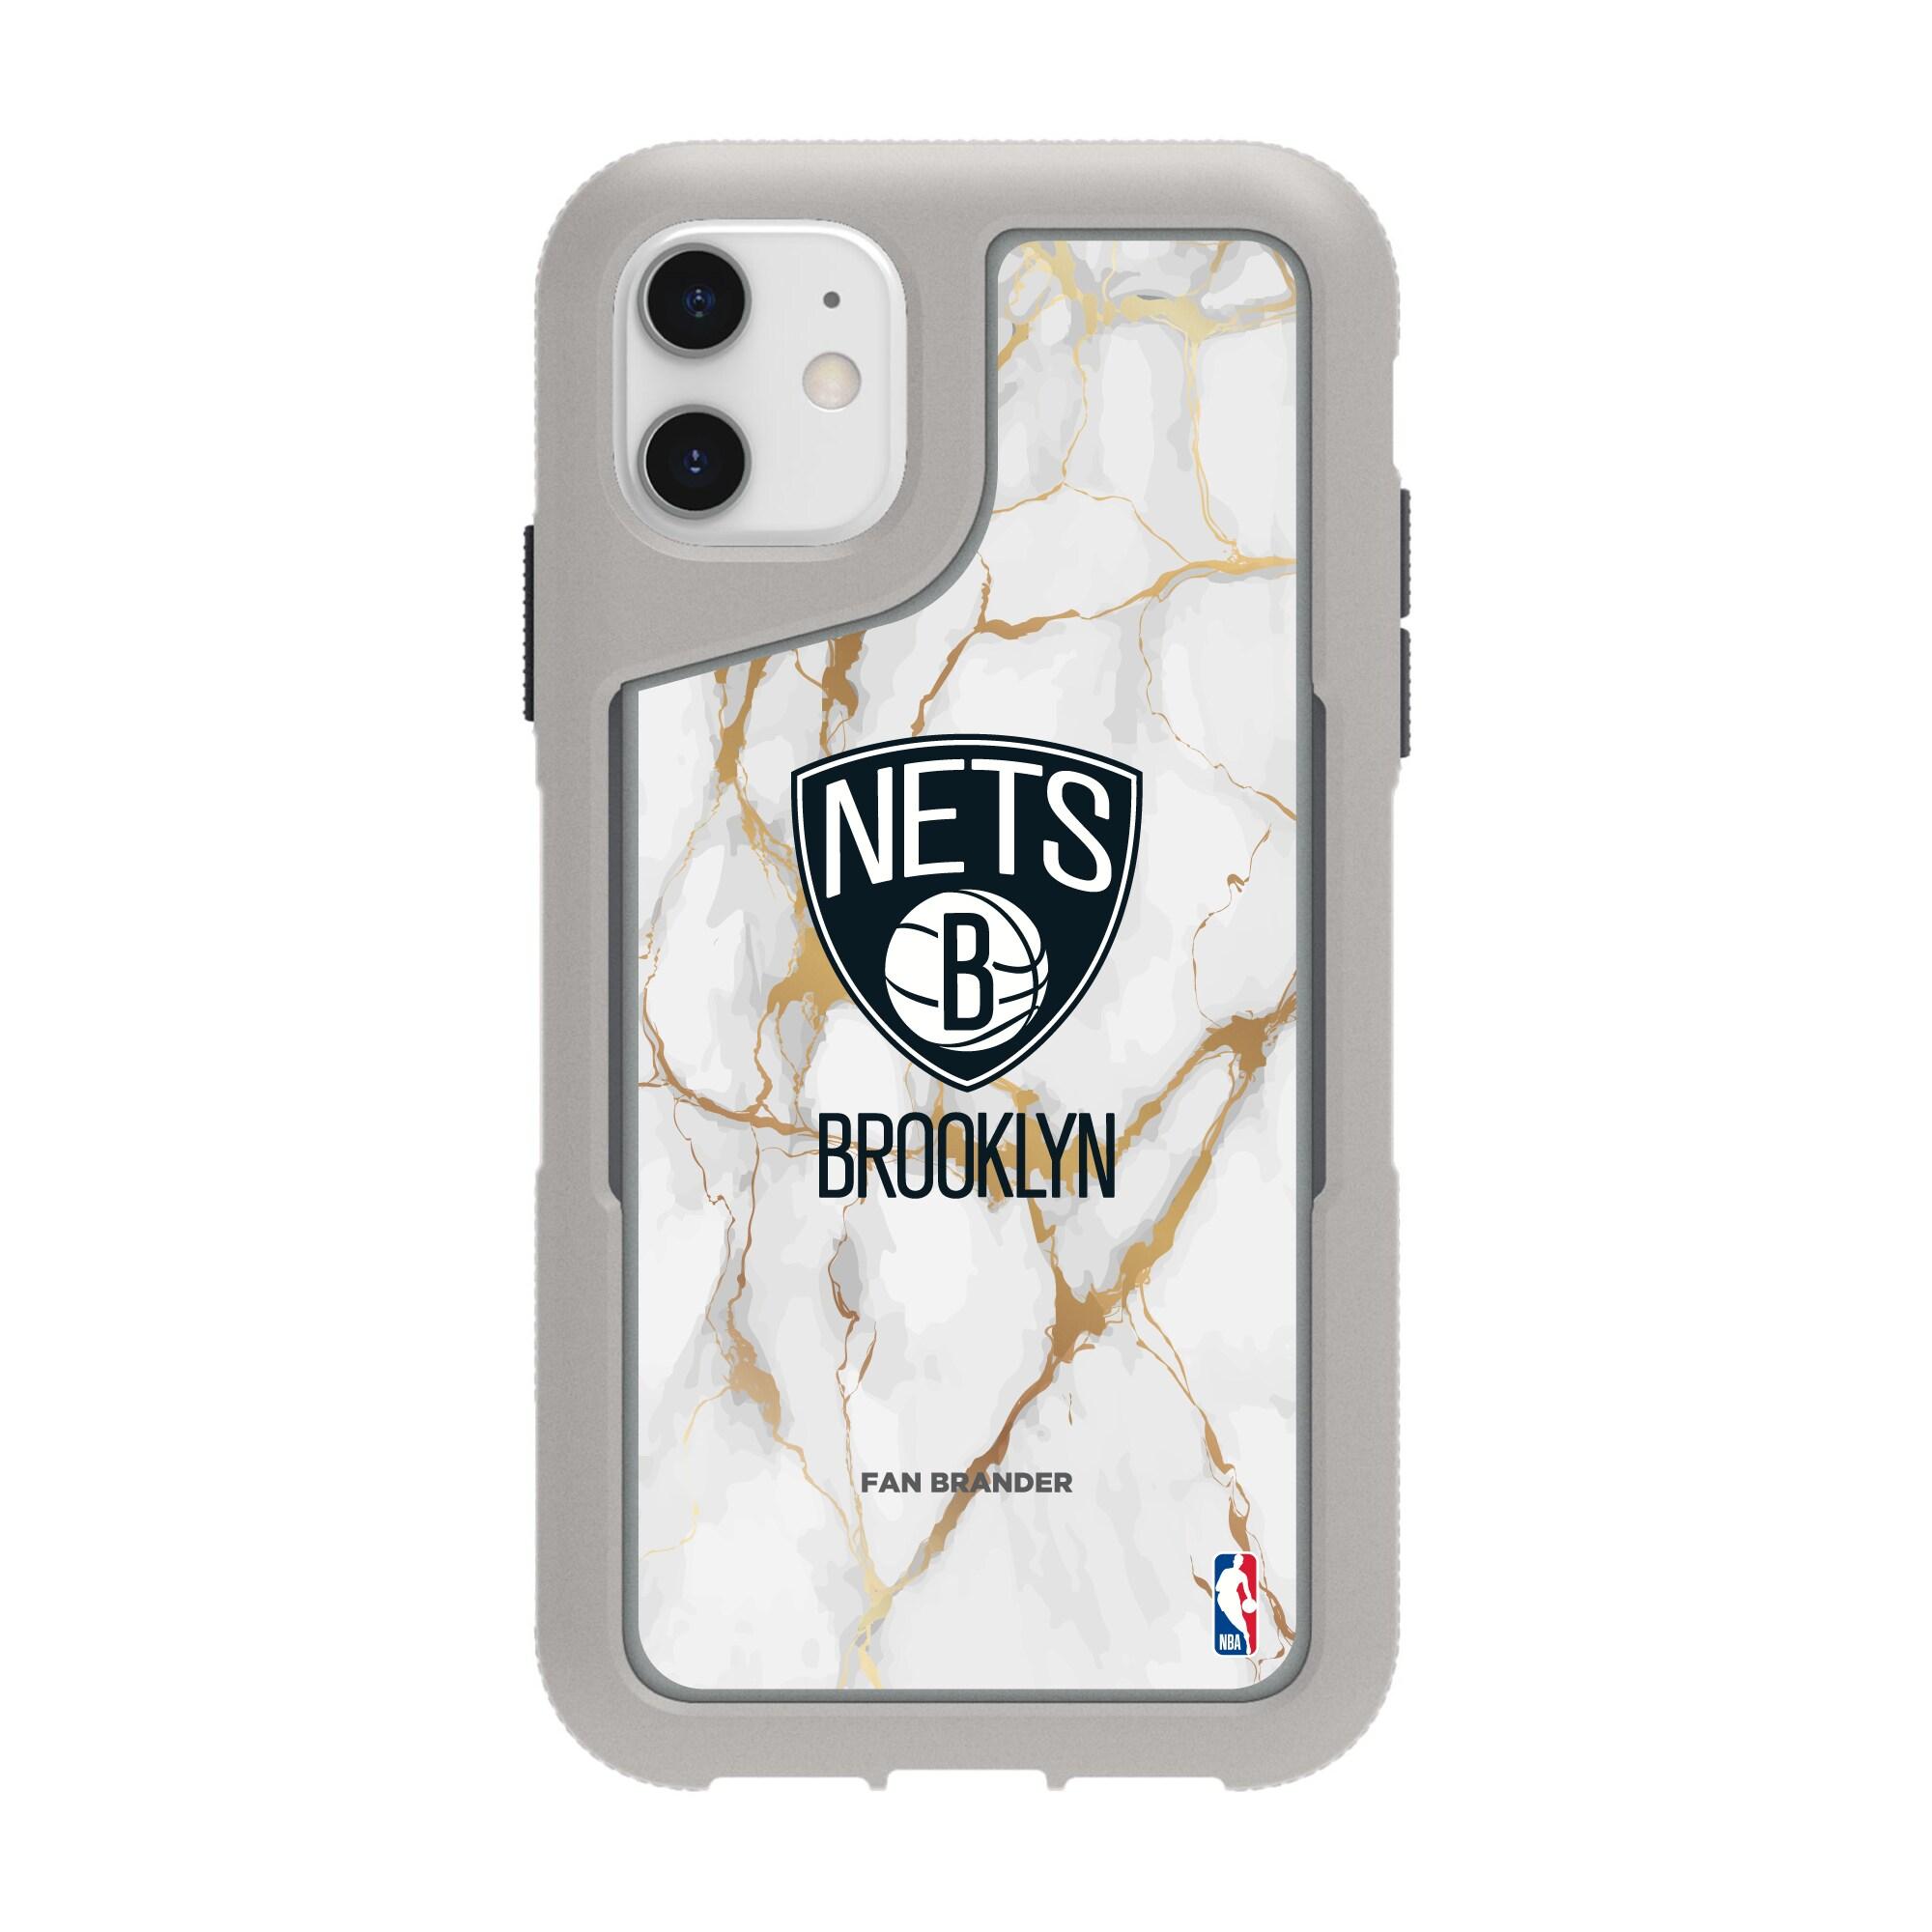 Brooklyn Nets Griffin Survivor Endurance Marble iPhone Case - Gray